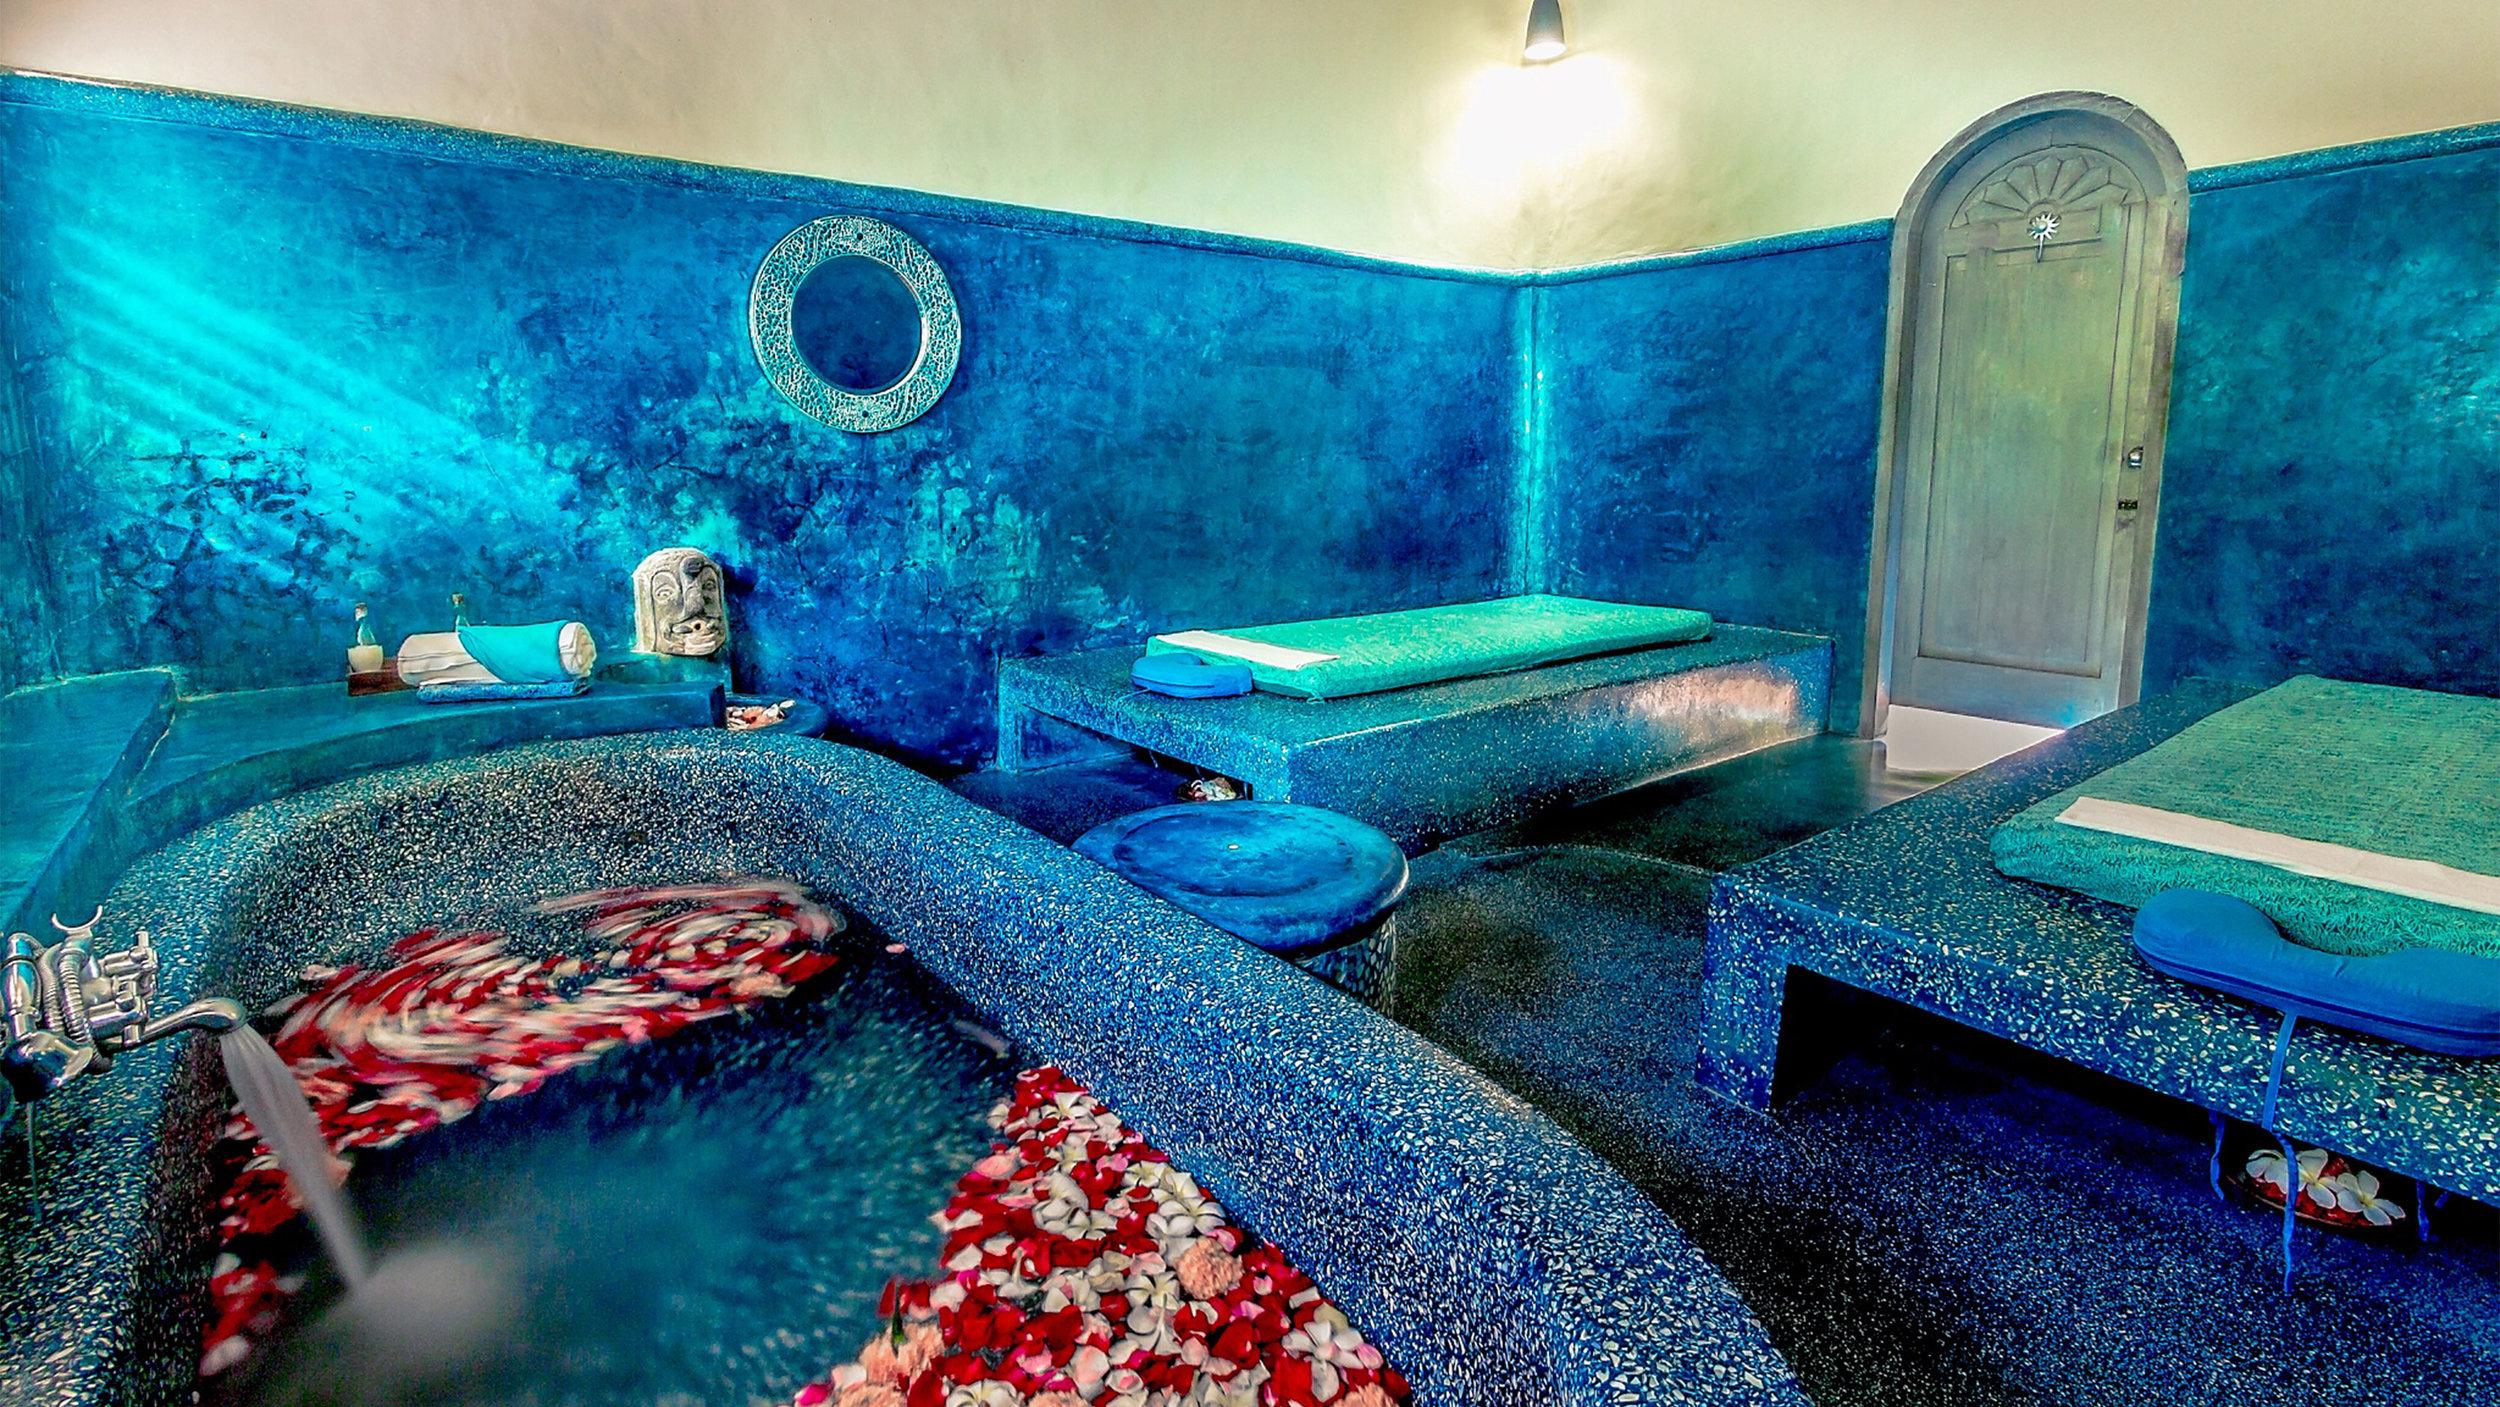 bali-bodyworks-day-spa-treatment-room.jpg